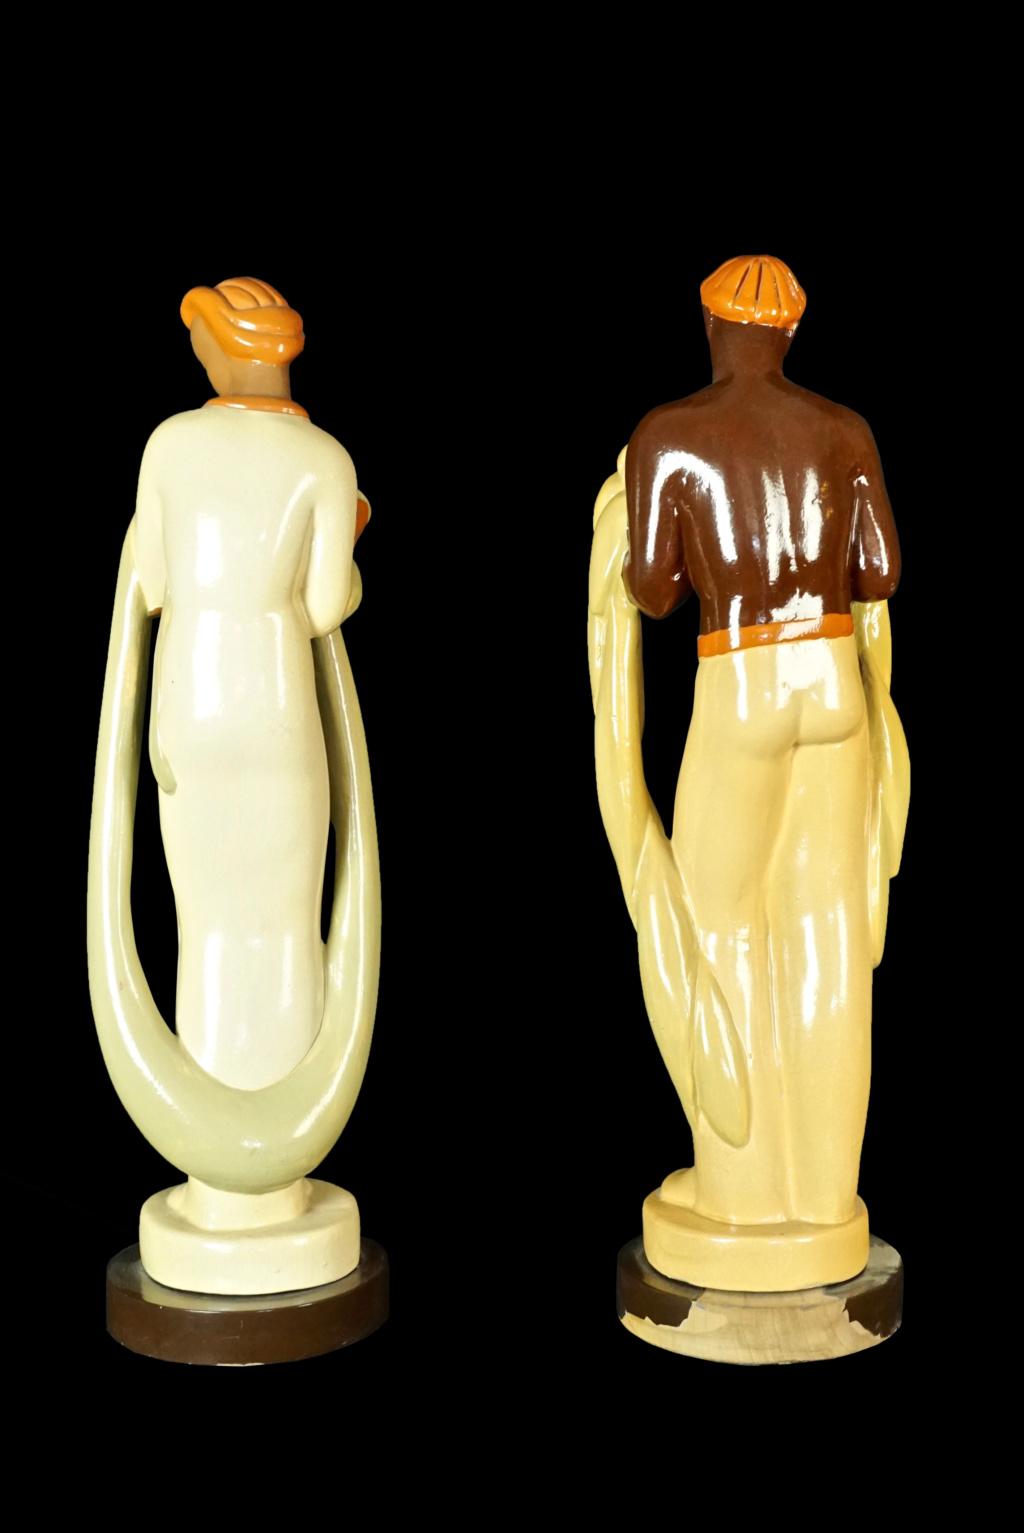 Pair of Pottery/Terra Cotta Figures Dsc04316